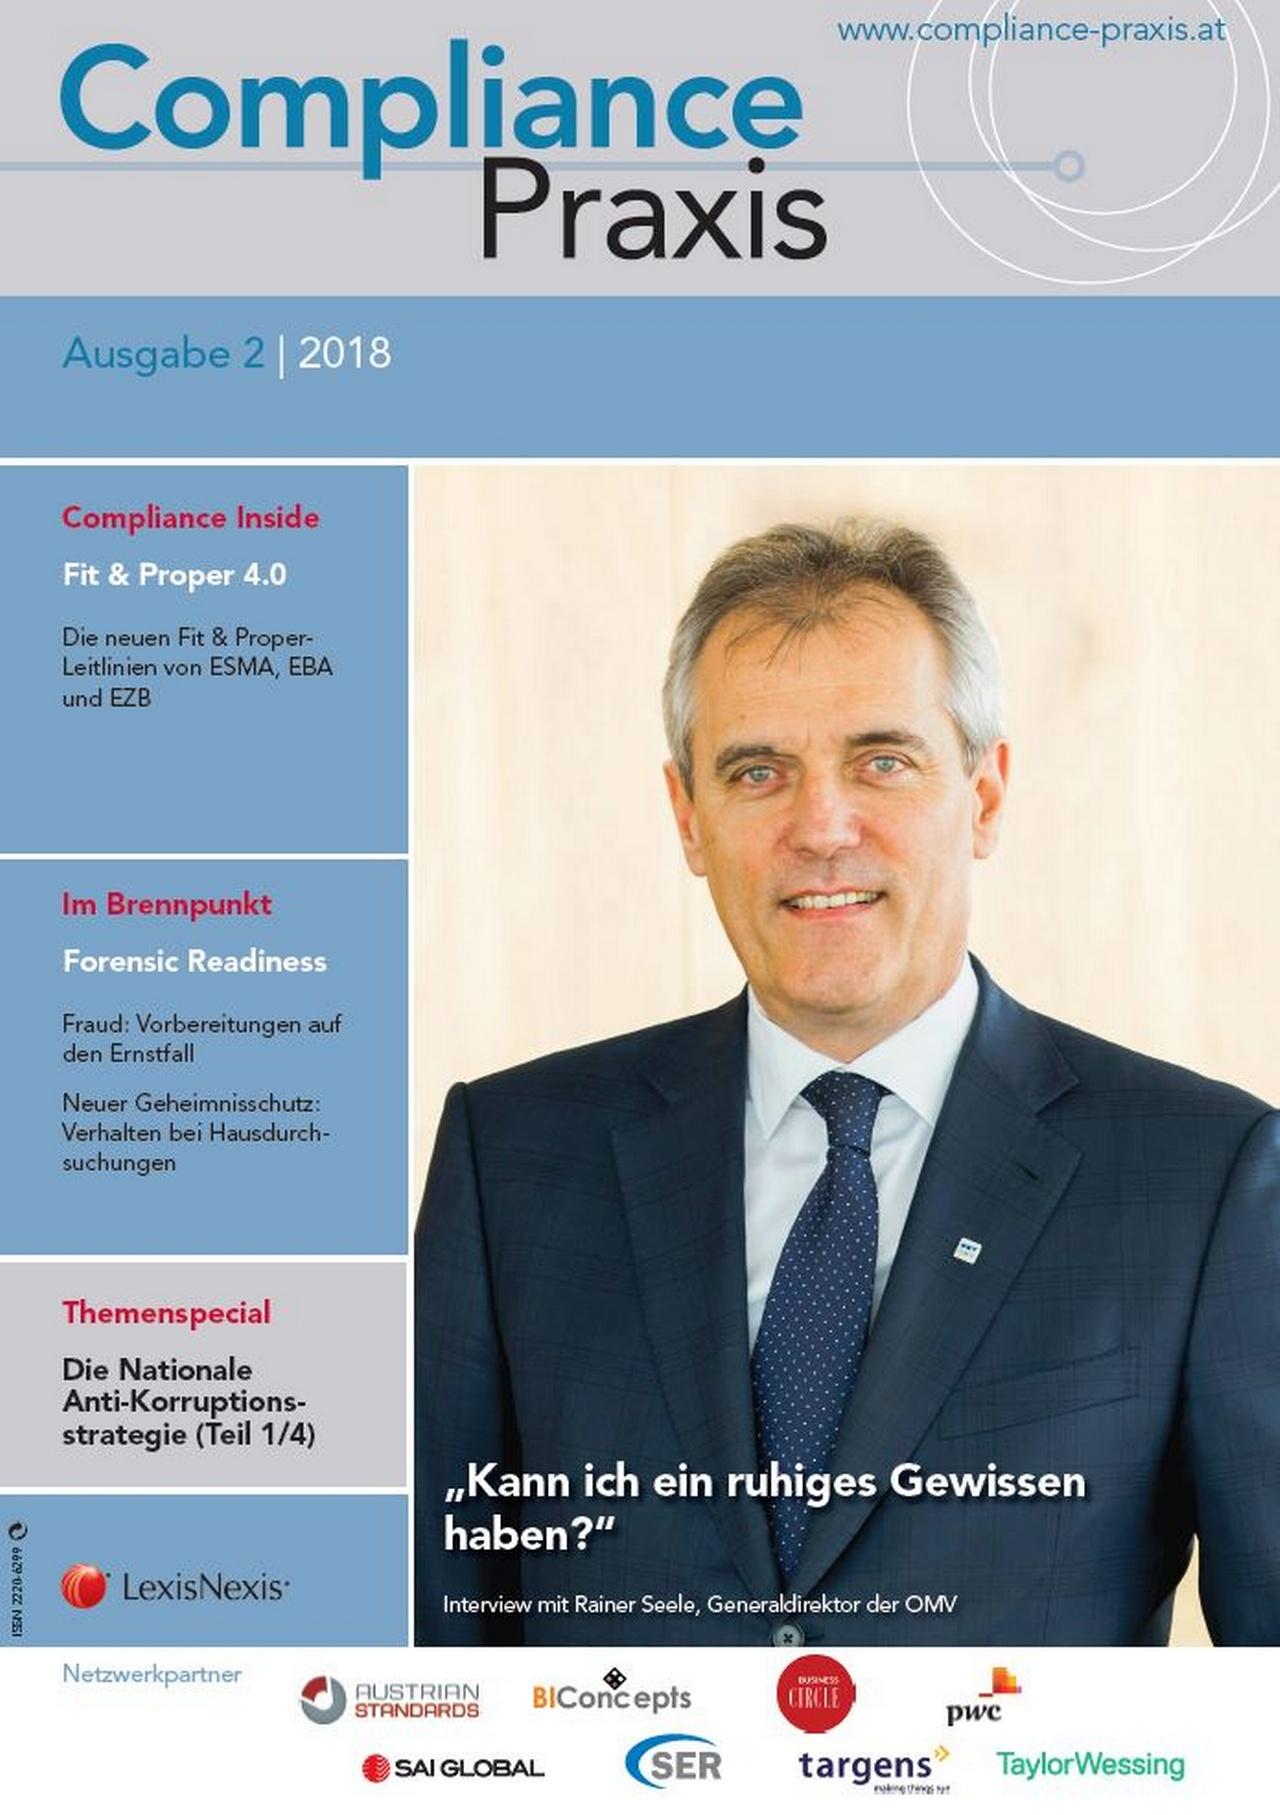 Cover von Compliance Praxis Ausgabe 2/2018, © LexisNexis